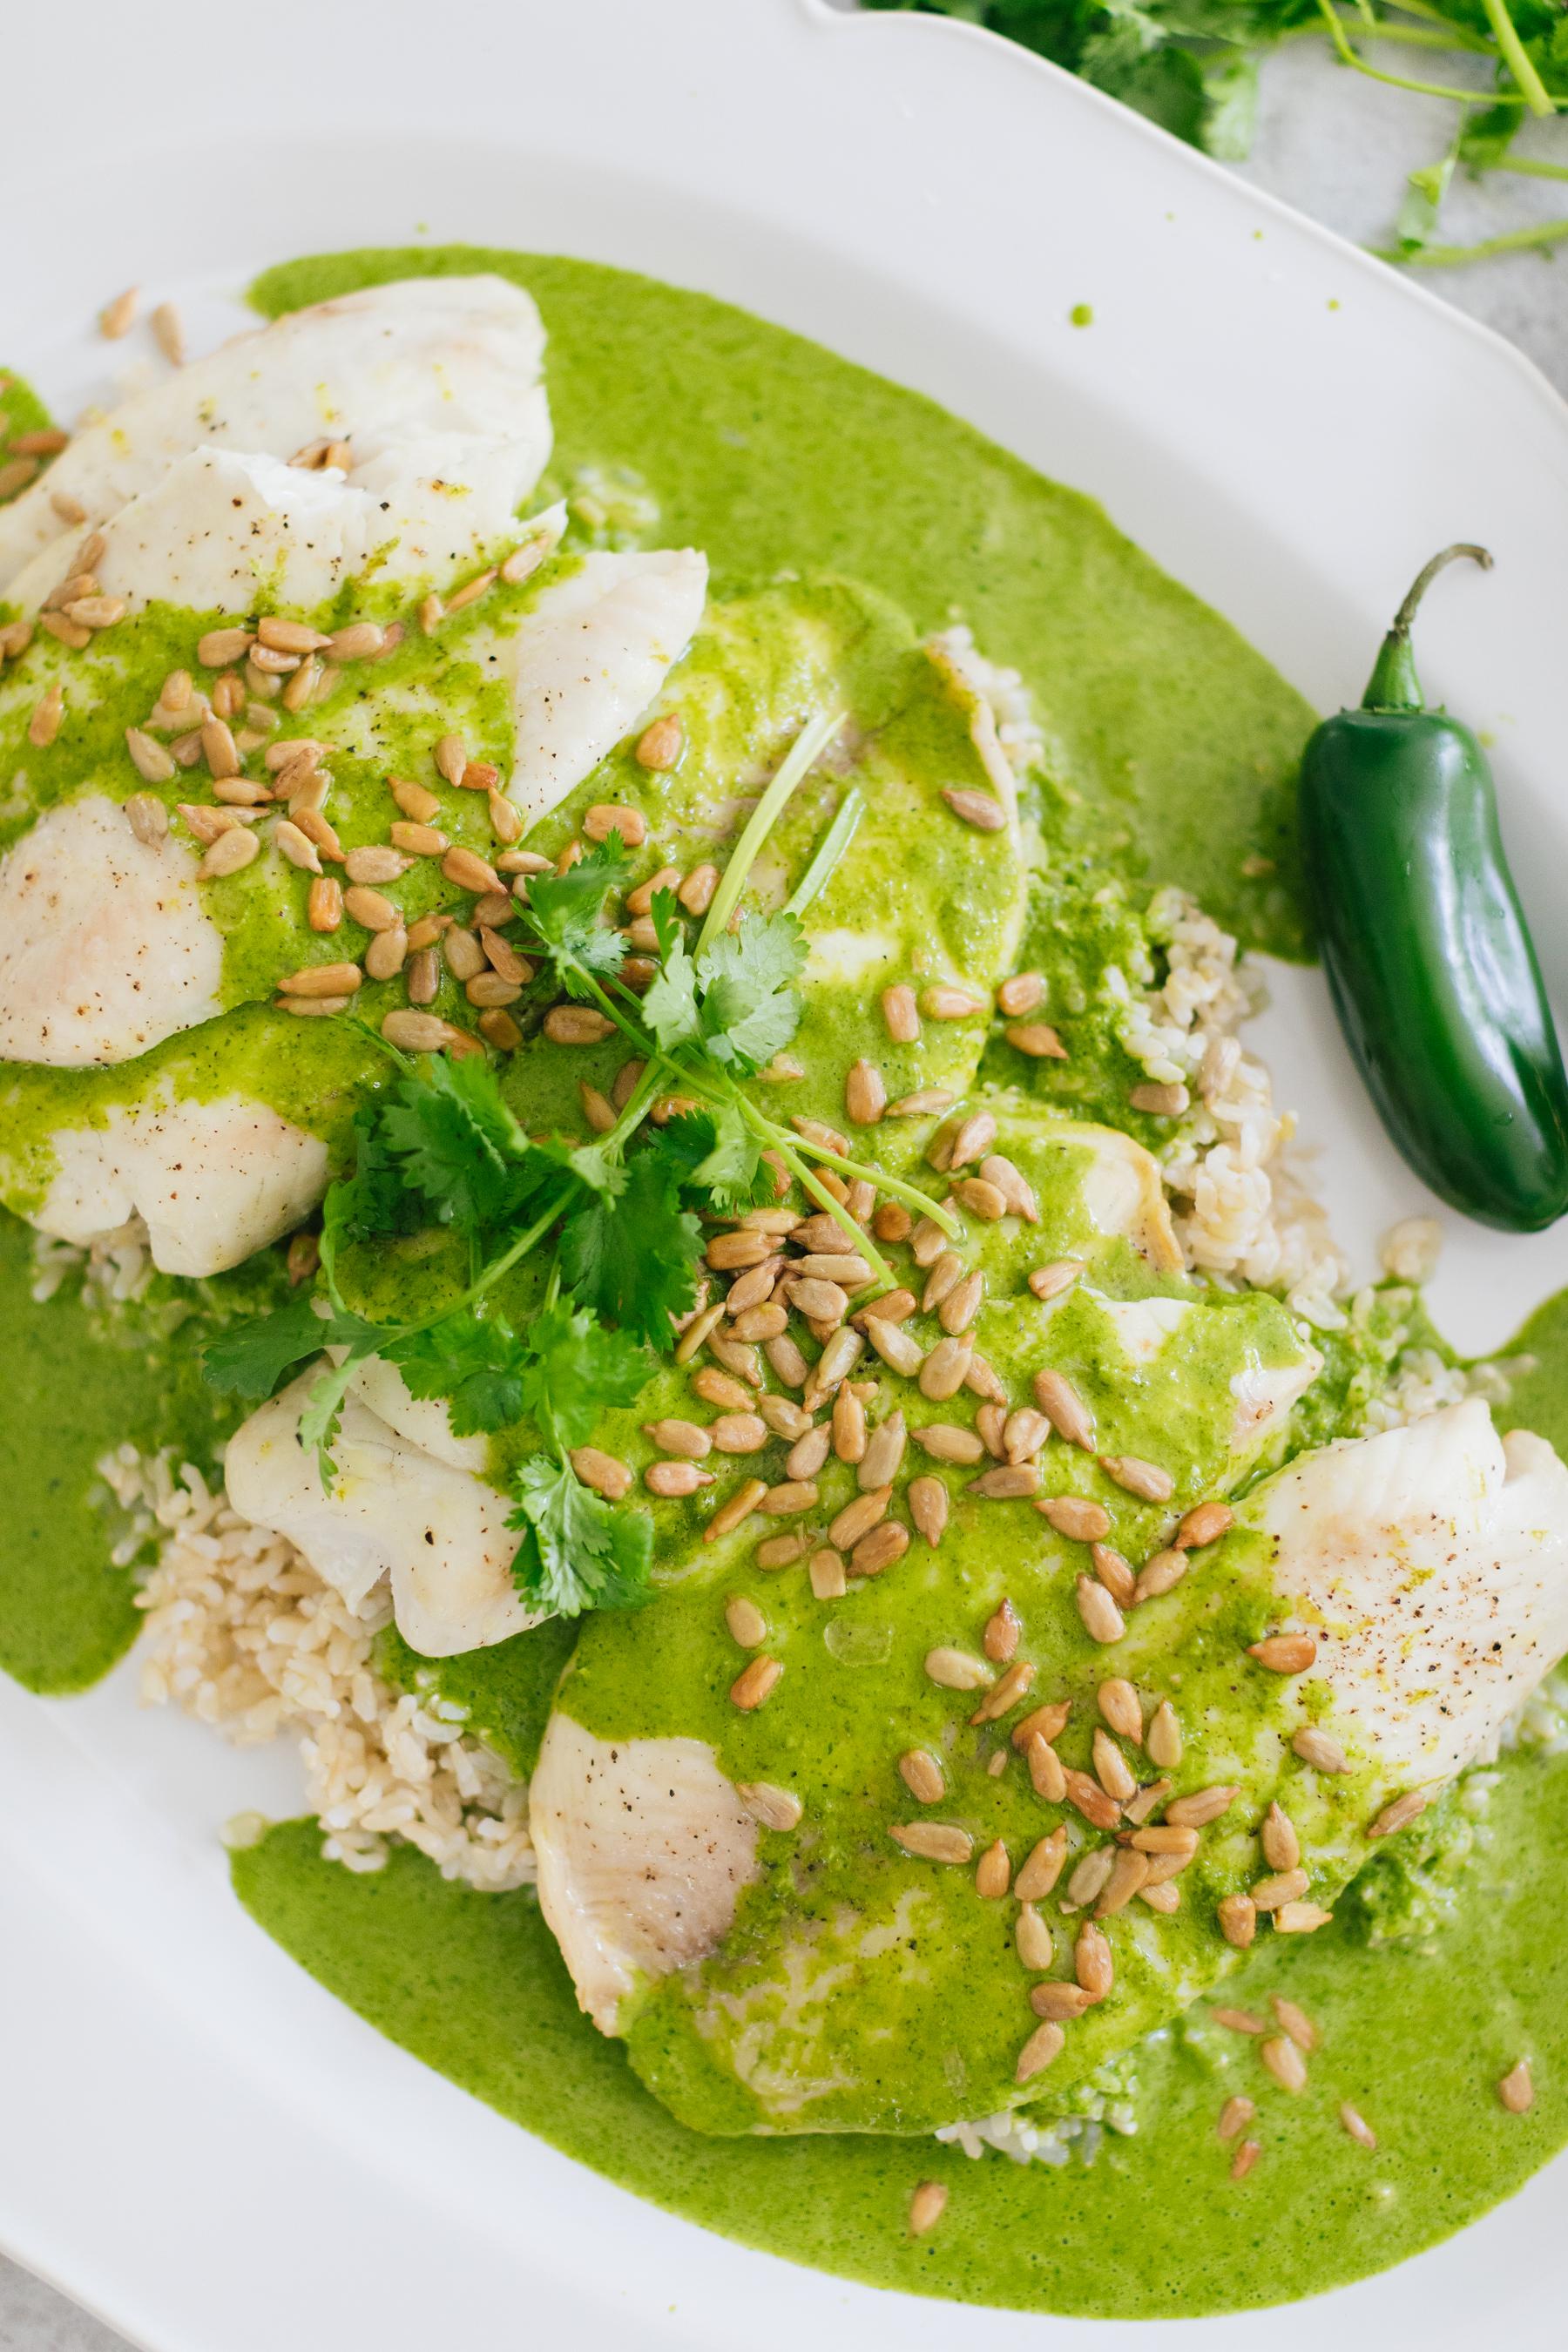 Eva Amurri shares Buster's Famous Green Fish Recipe